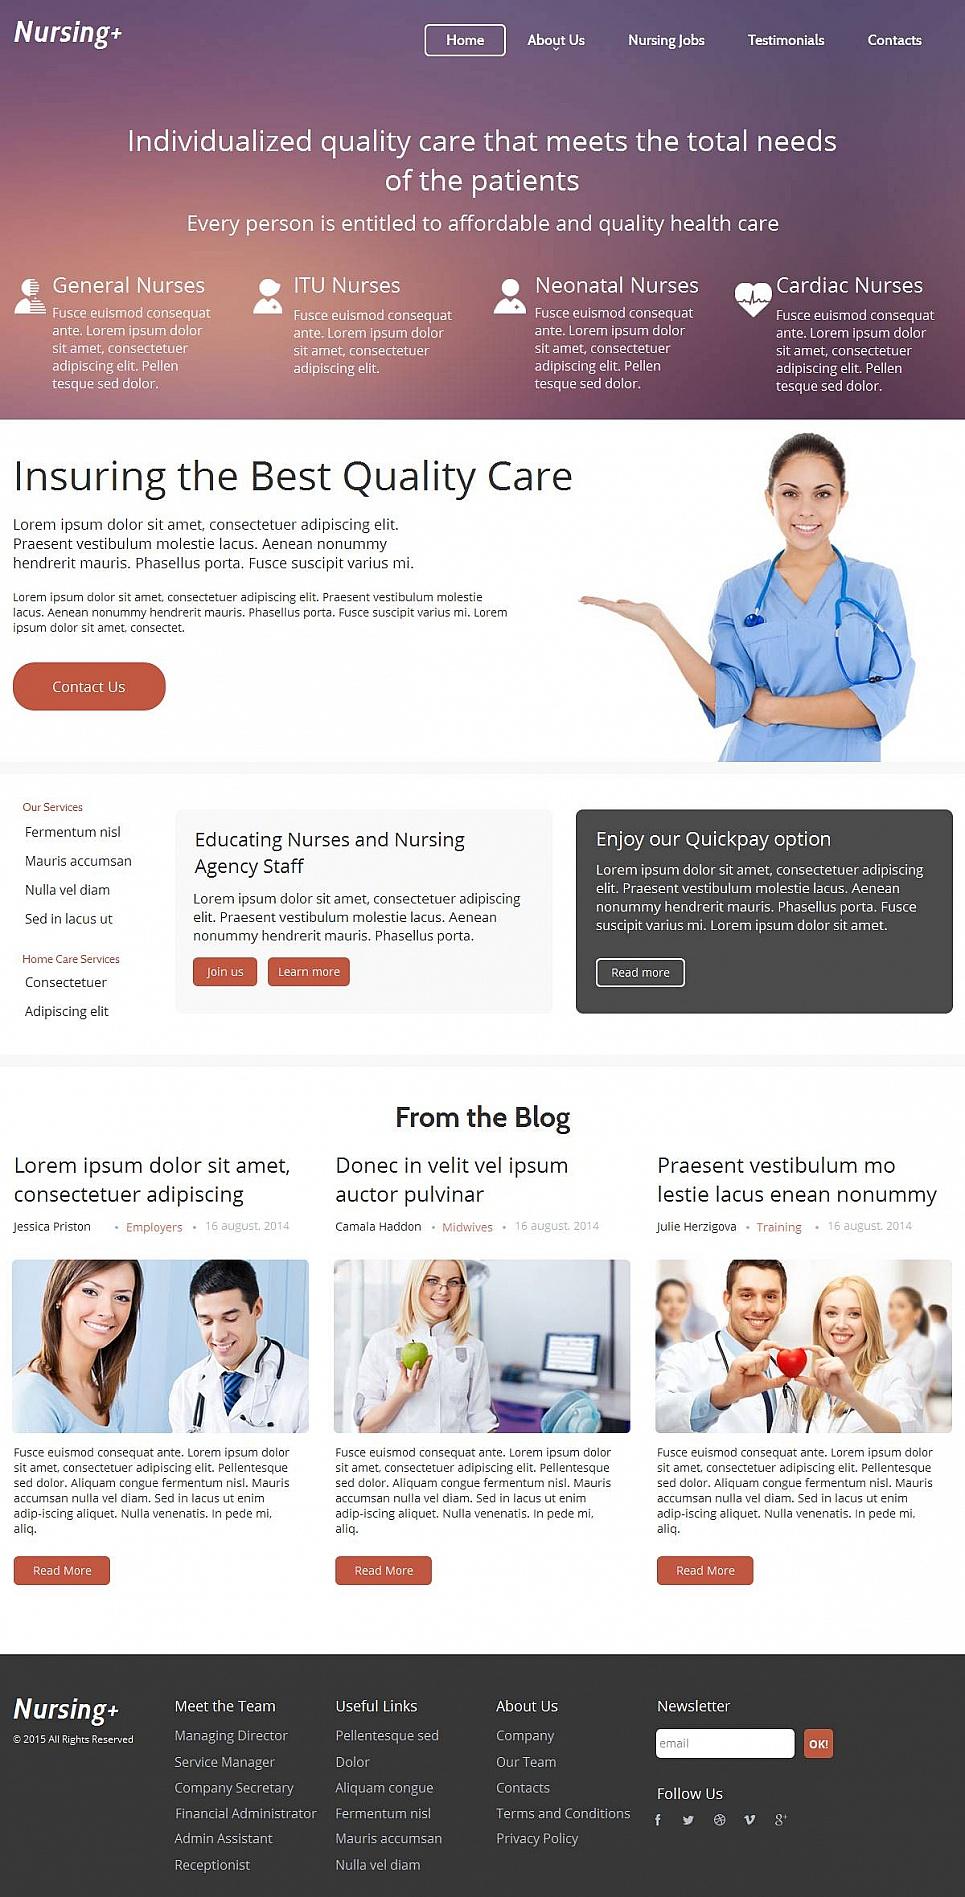 Nursing Care Website Design - image